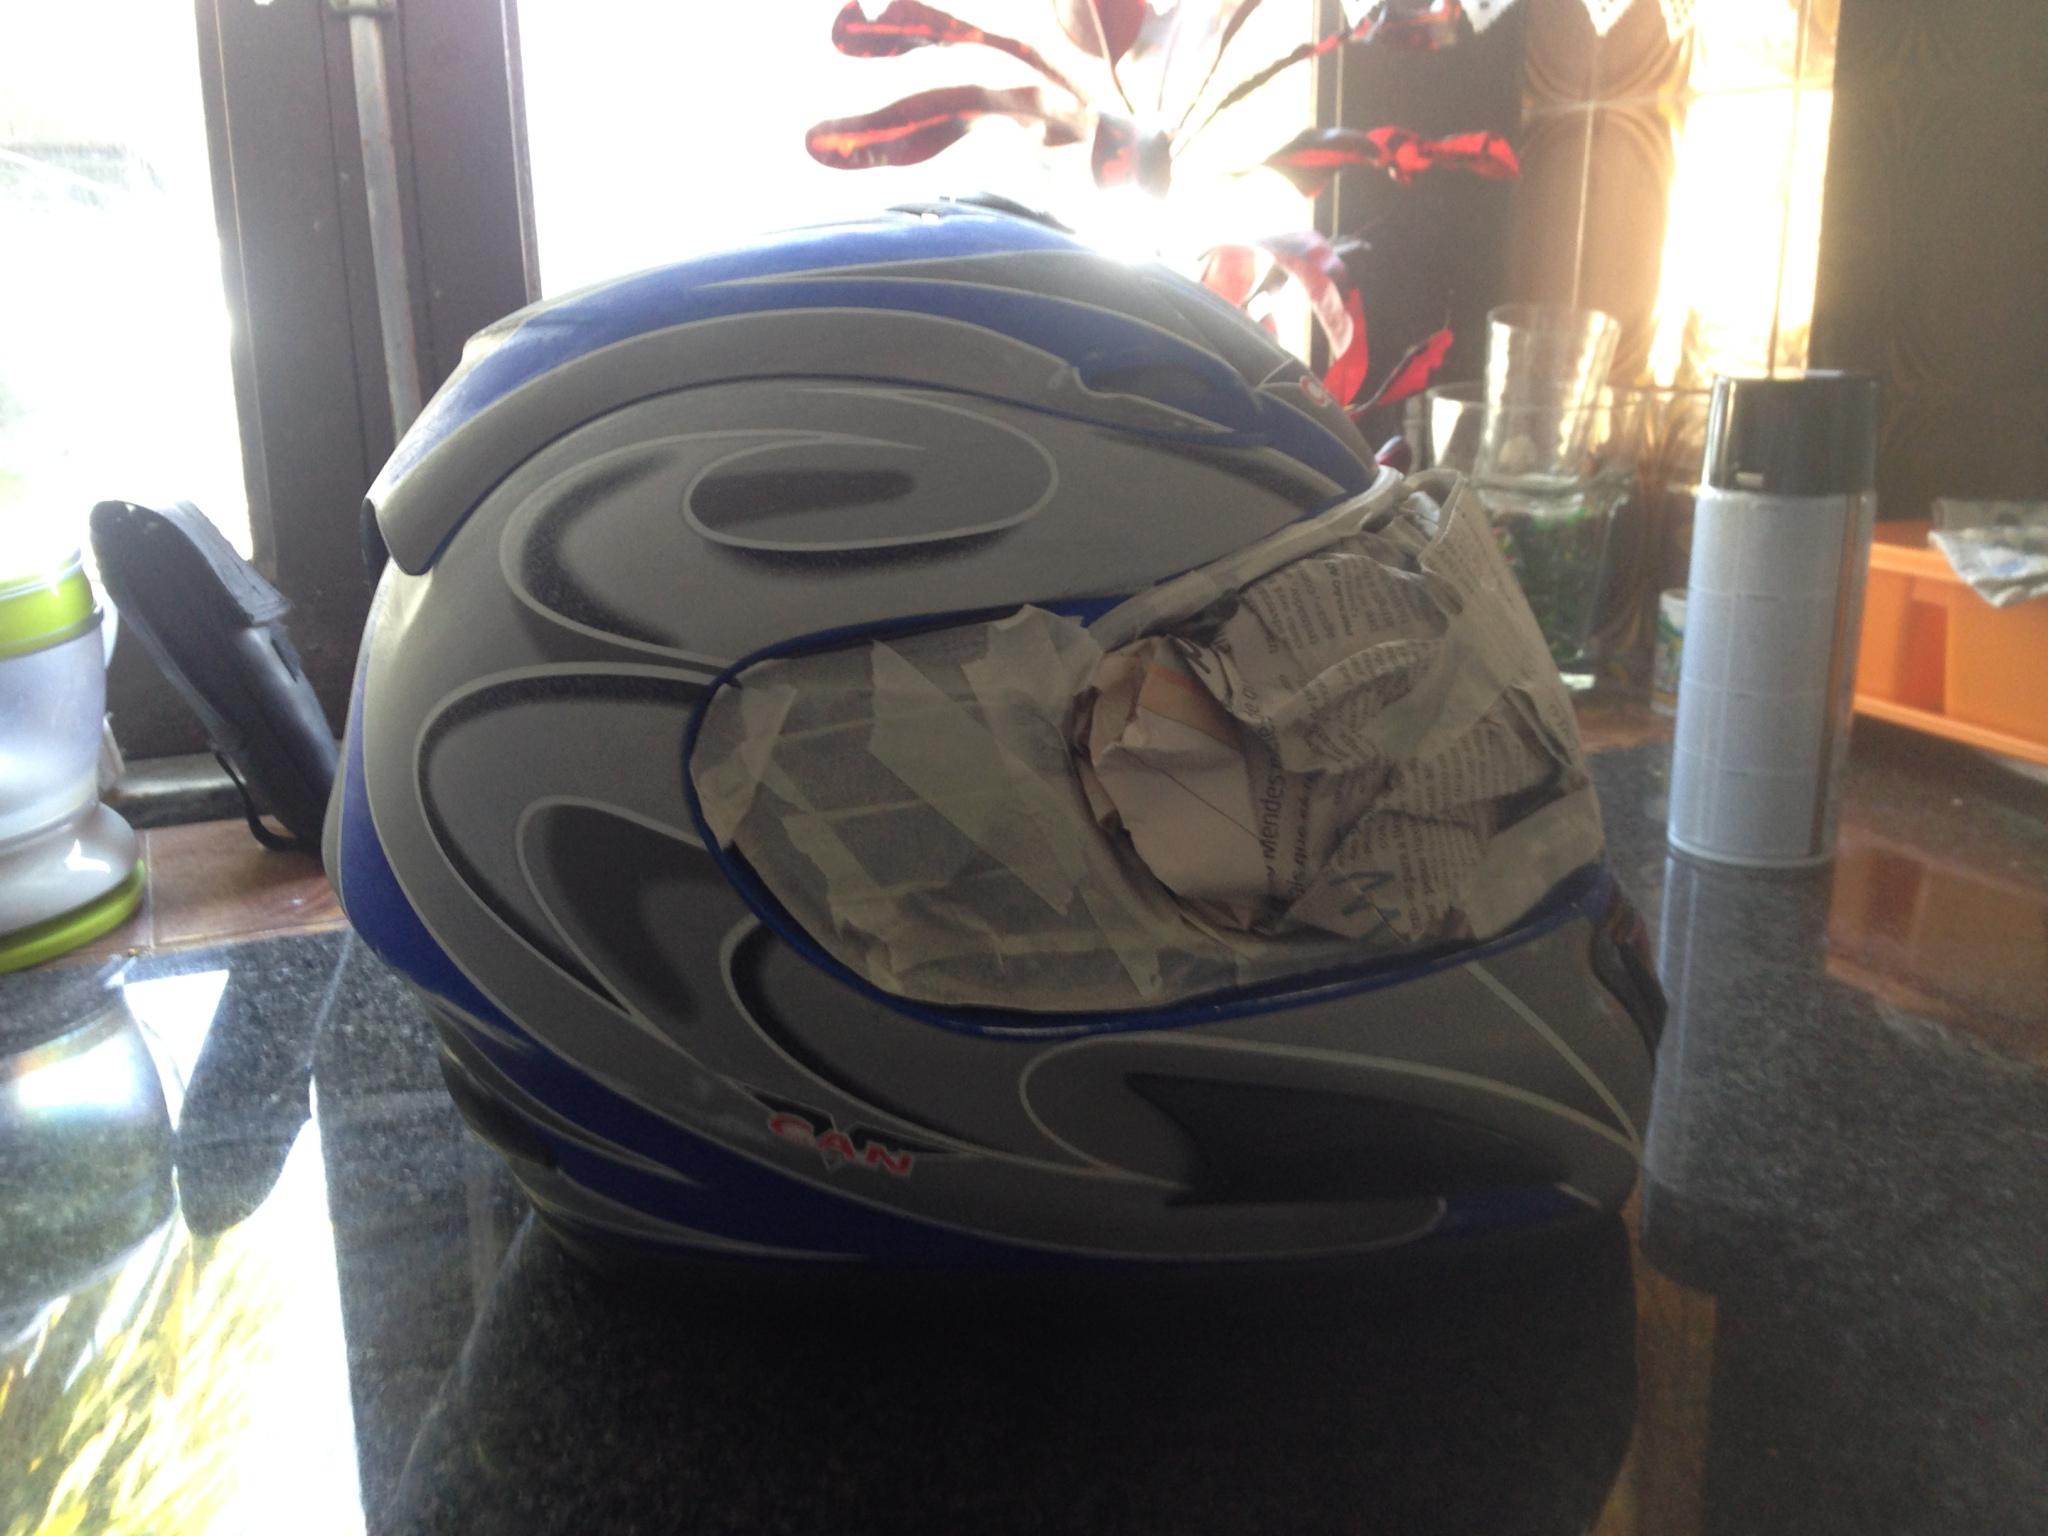 Autocolantes na moto/capacete  5uiall